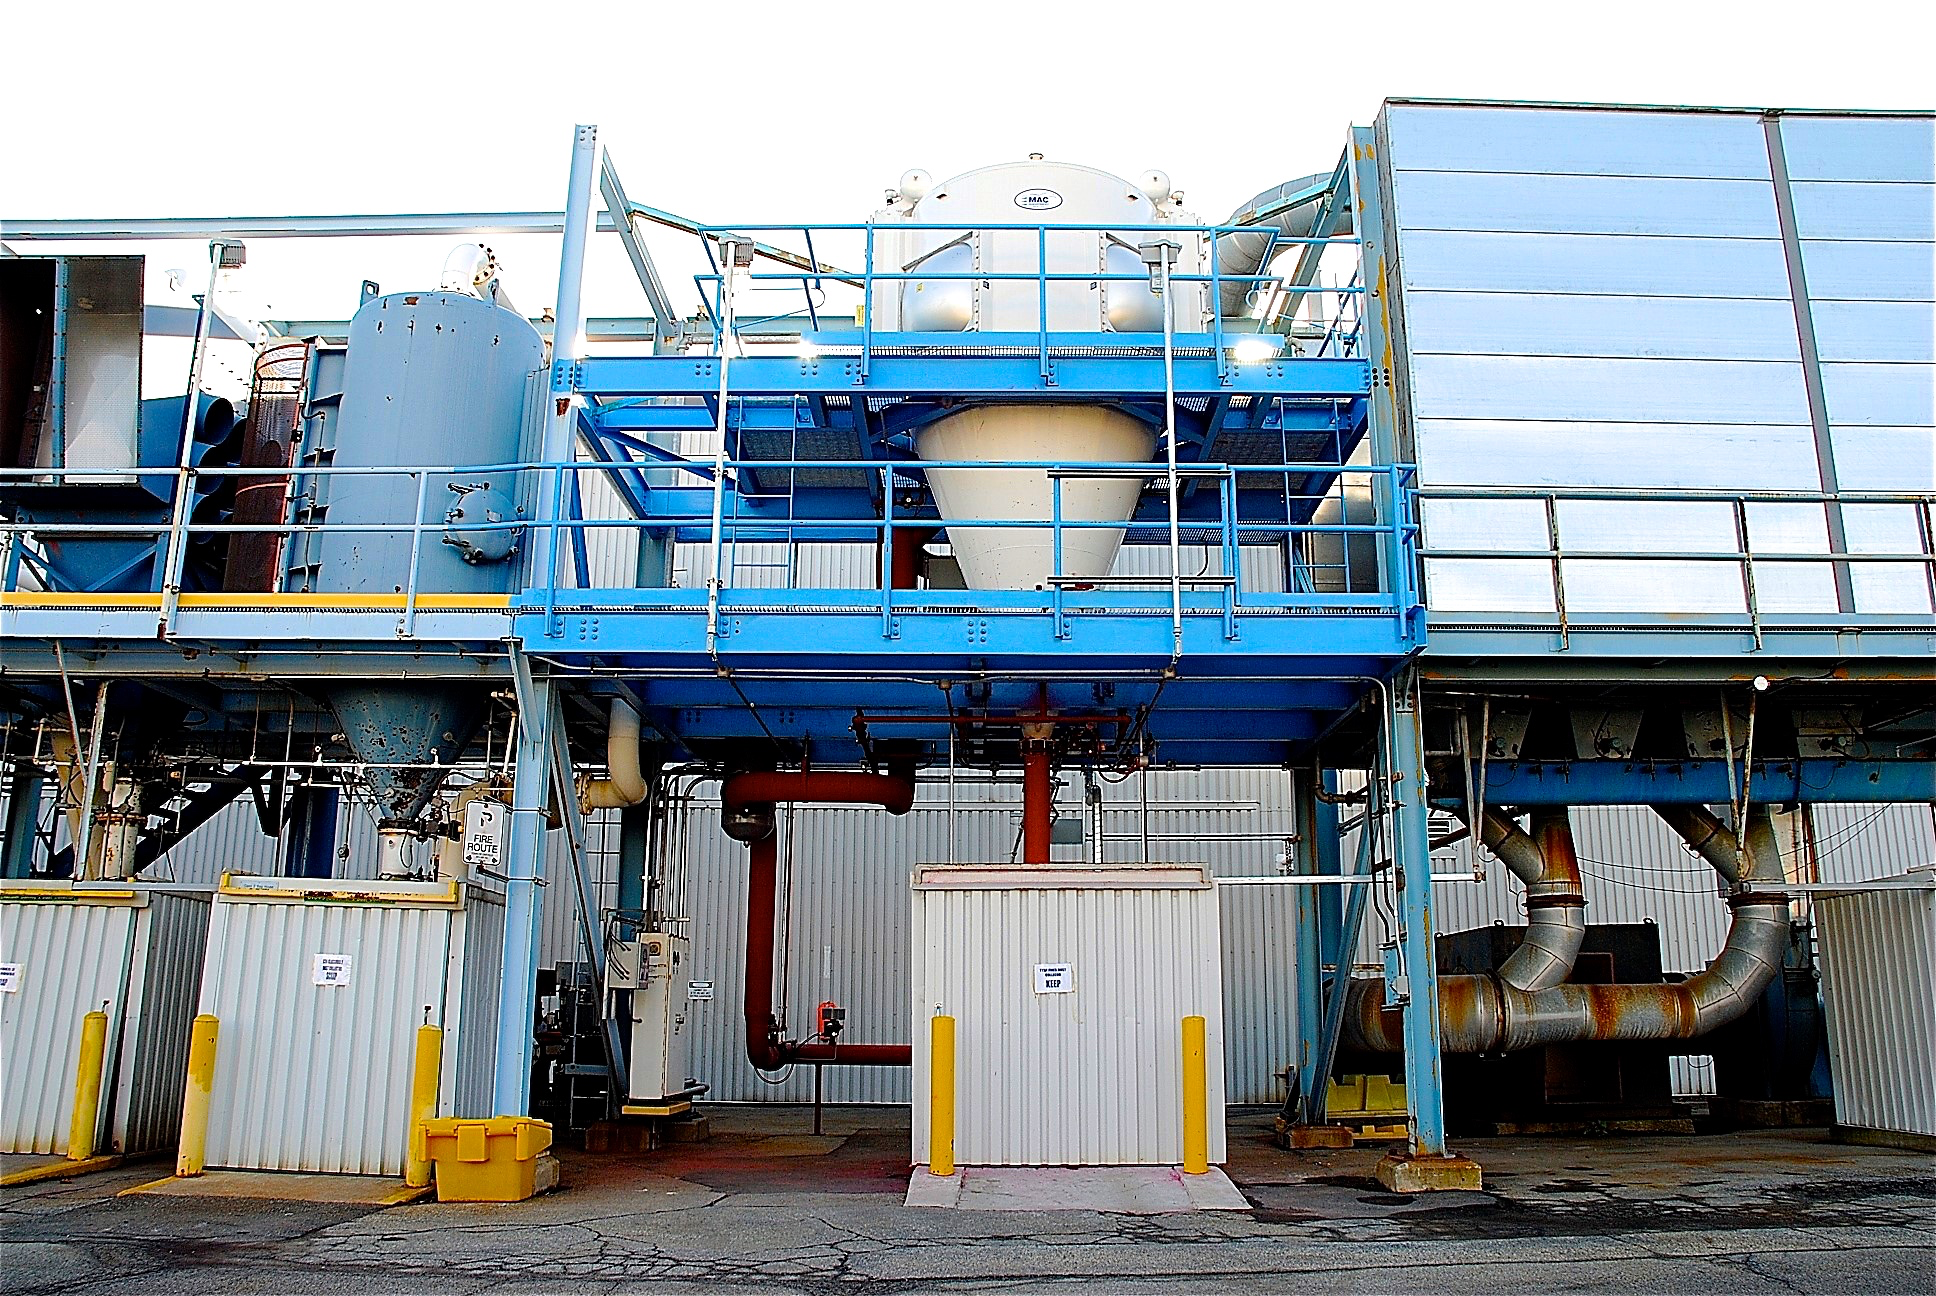 Xerox Industrial Plant